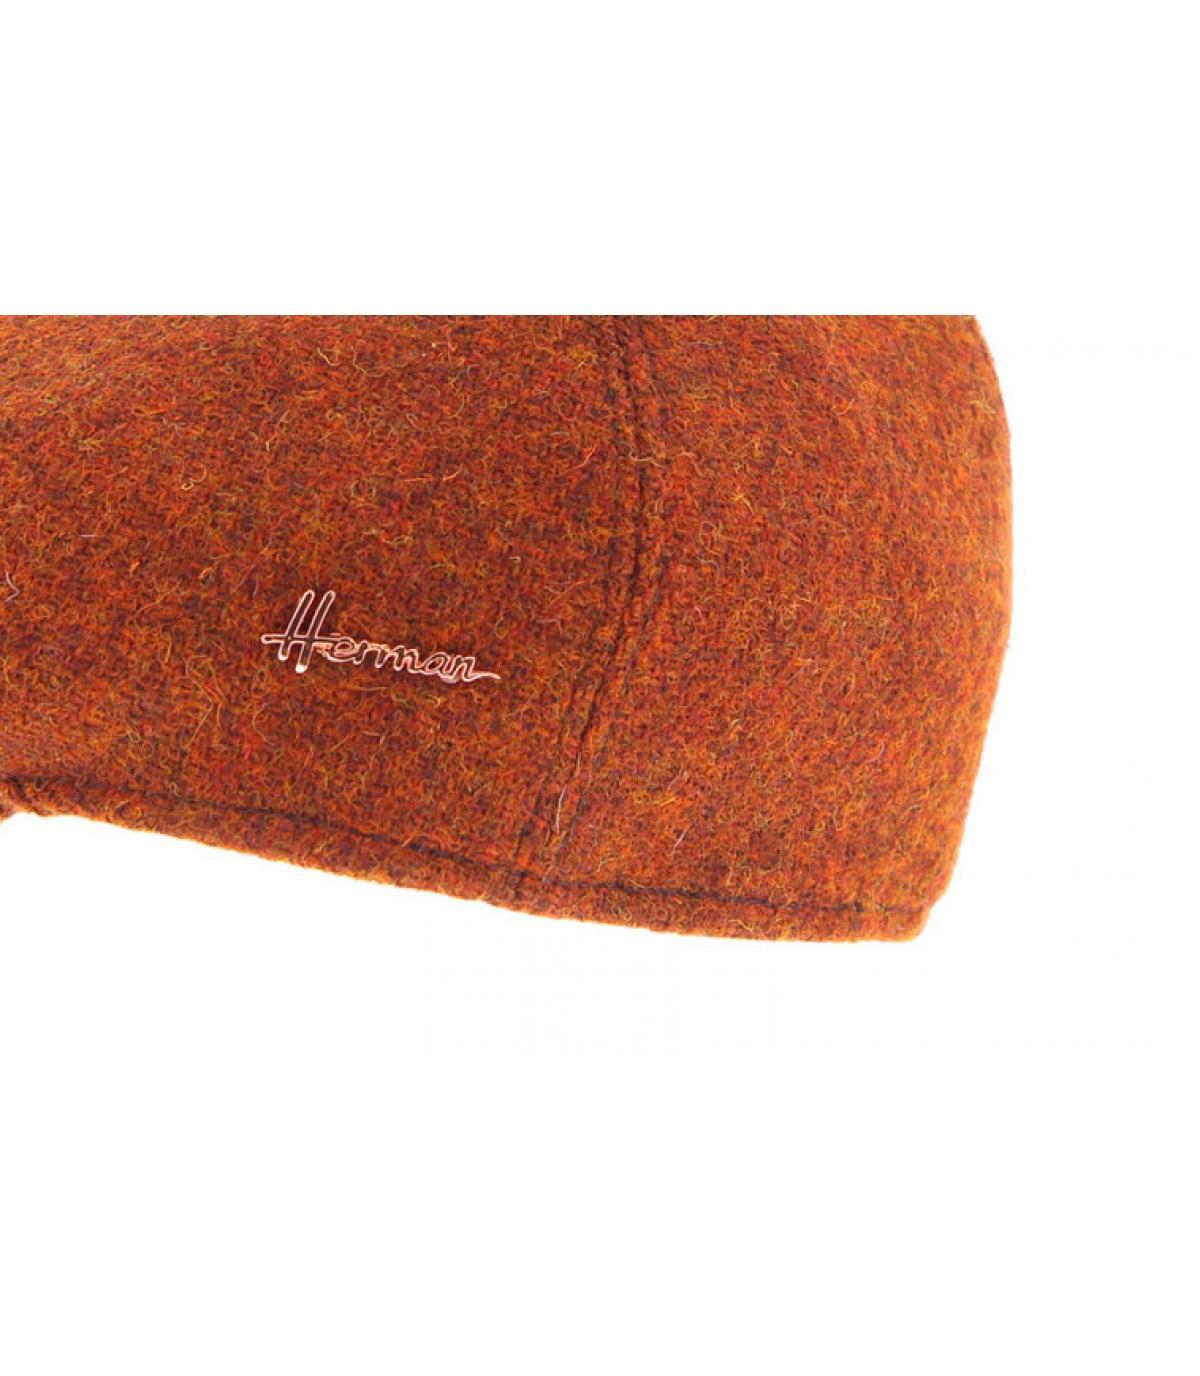 Détails Usurper Harris Tweed orange - image 3